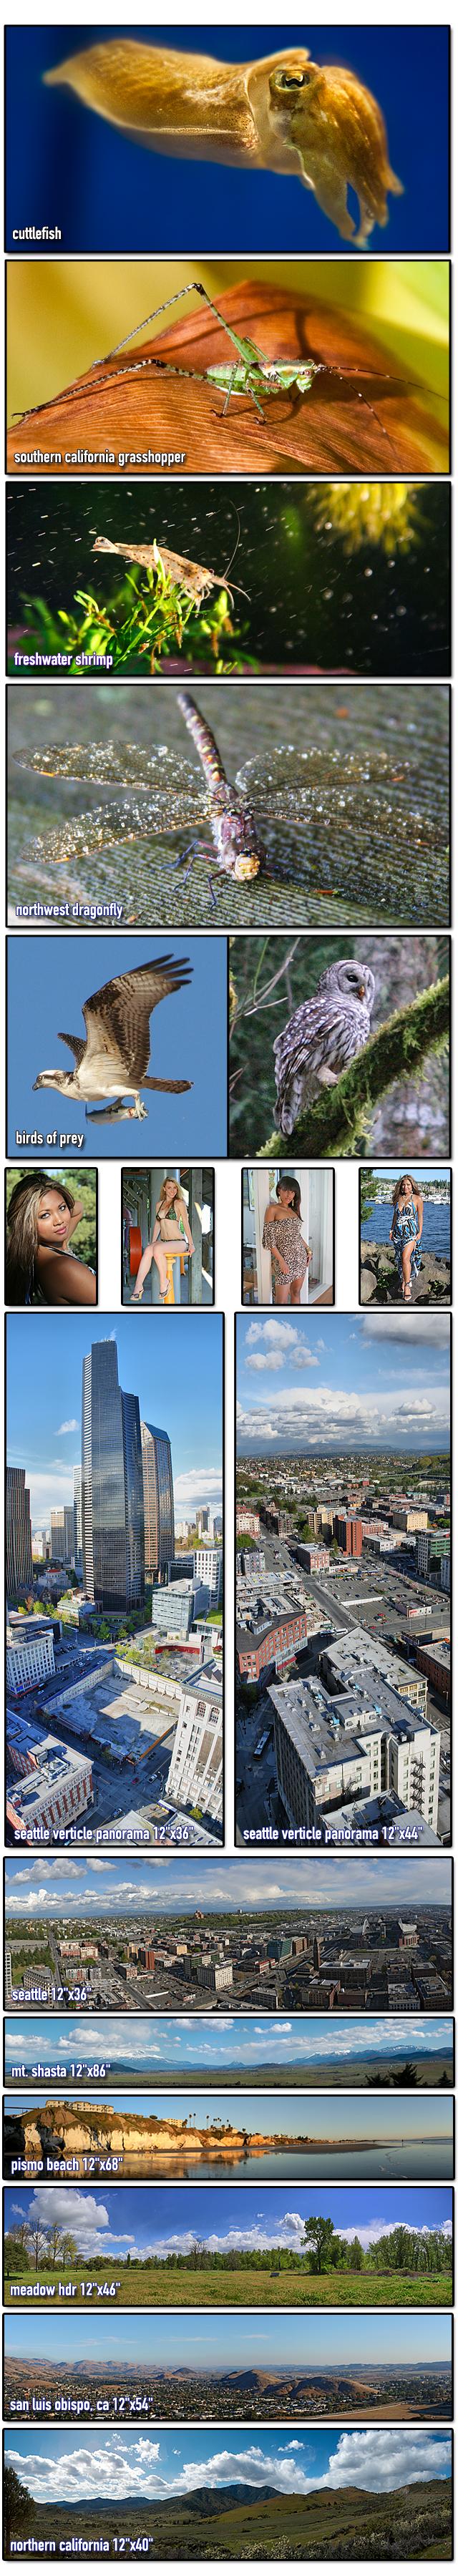 http://www.s295781917.onlinehome.us/wsb5461660001/Macro-Advert-Edited.jpg